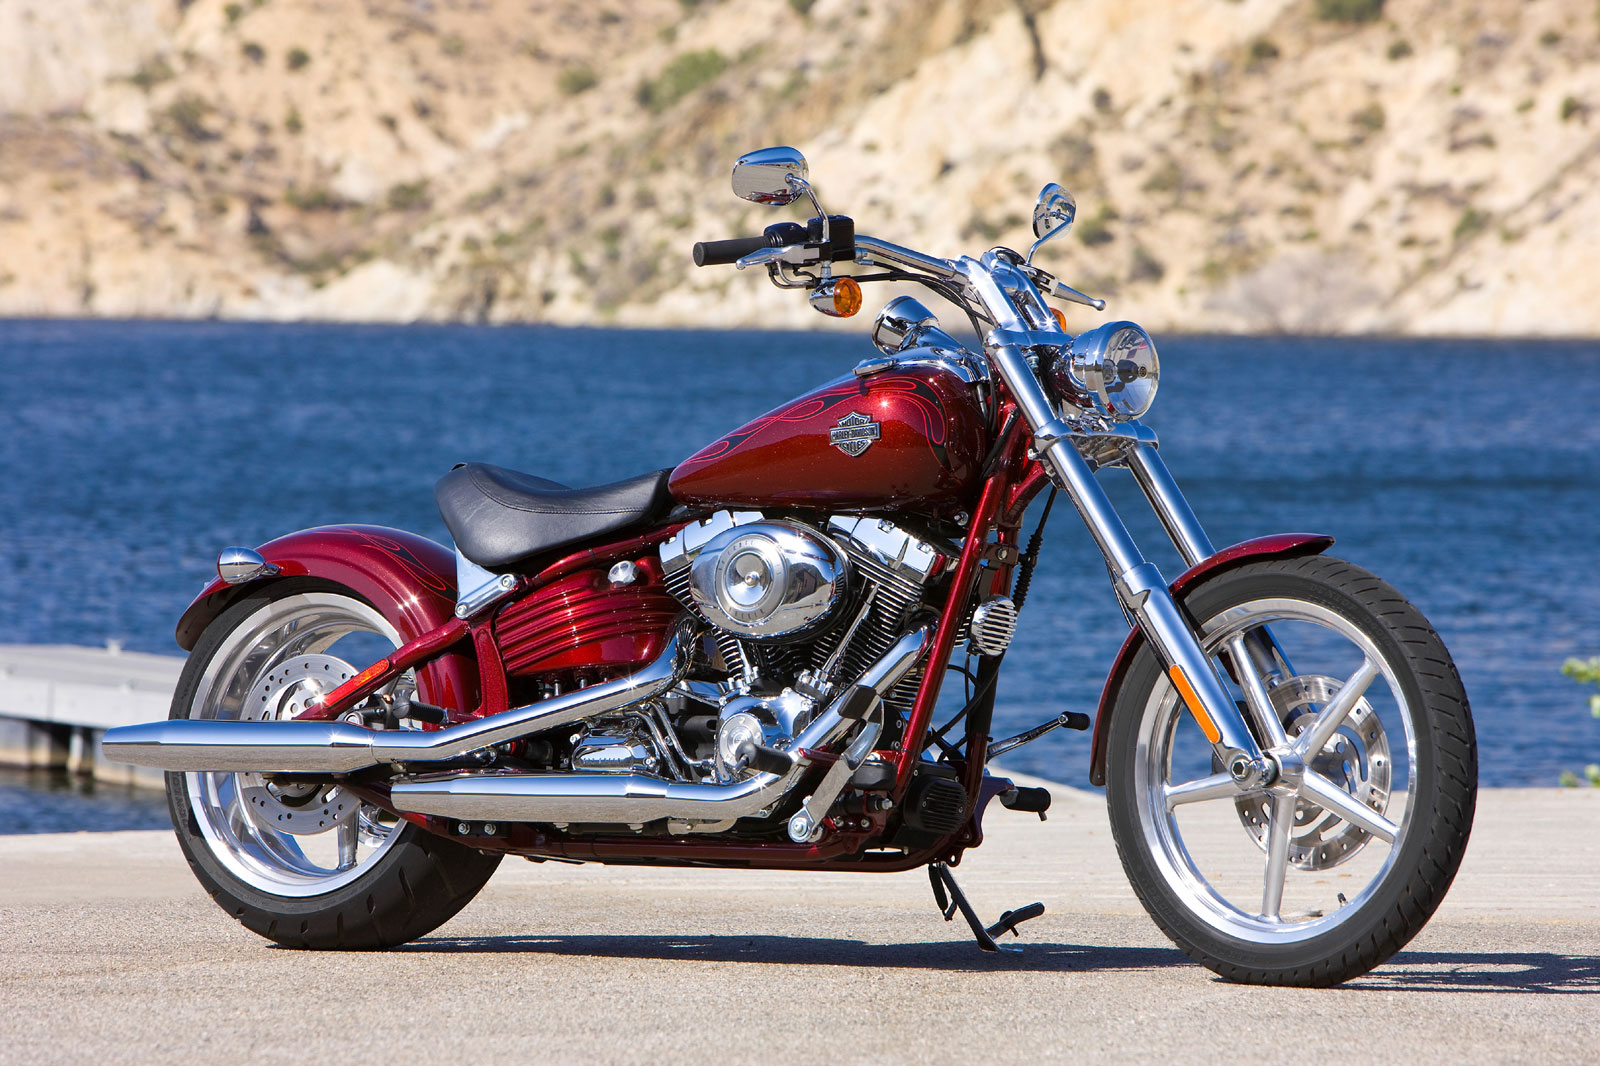 Harley Davidson Video 1988 Honda Accord Ignition Wiring Diagram Bikes 2011 Fxcwc Rocker C